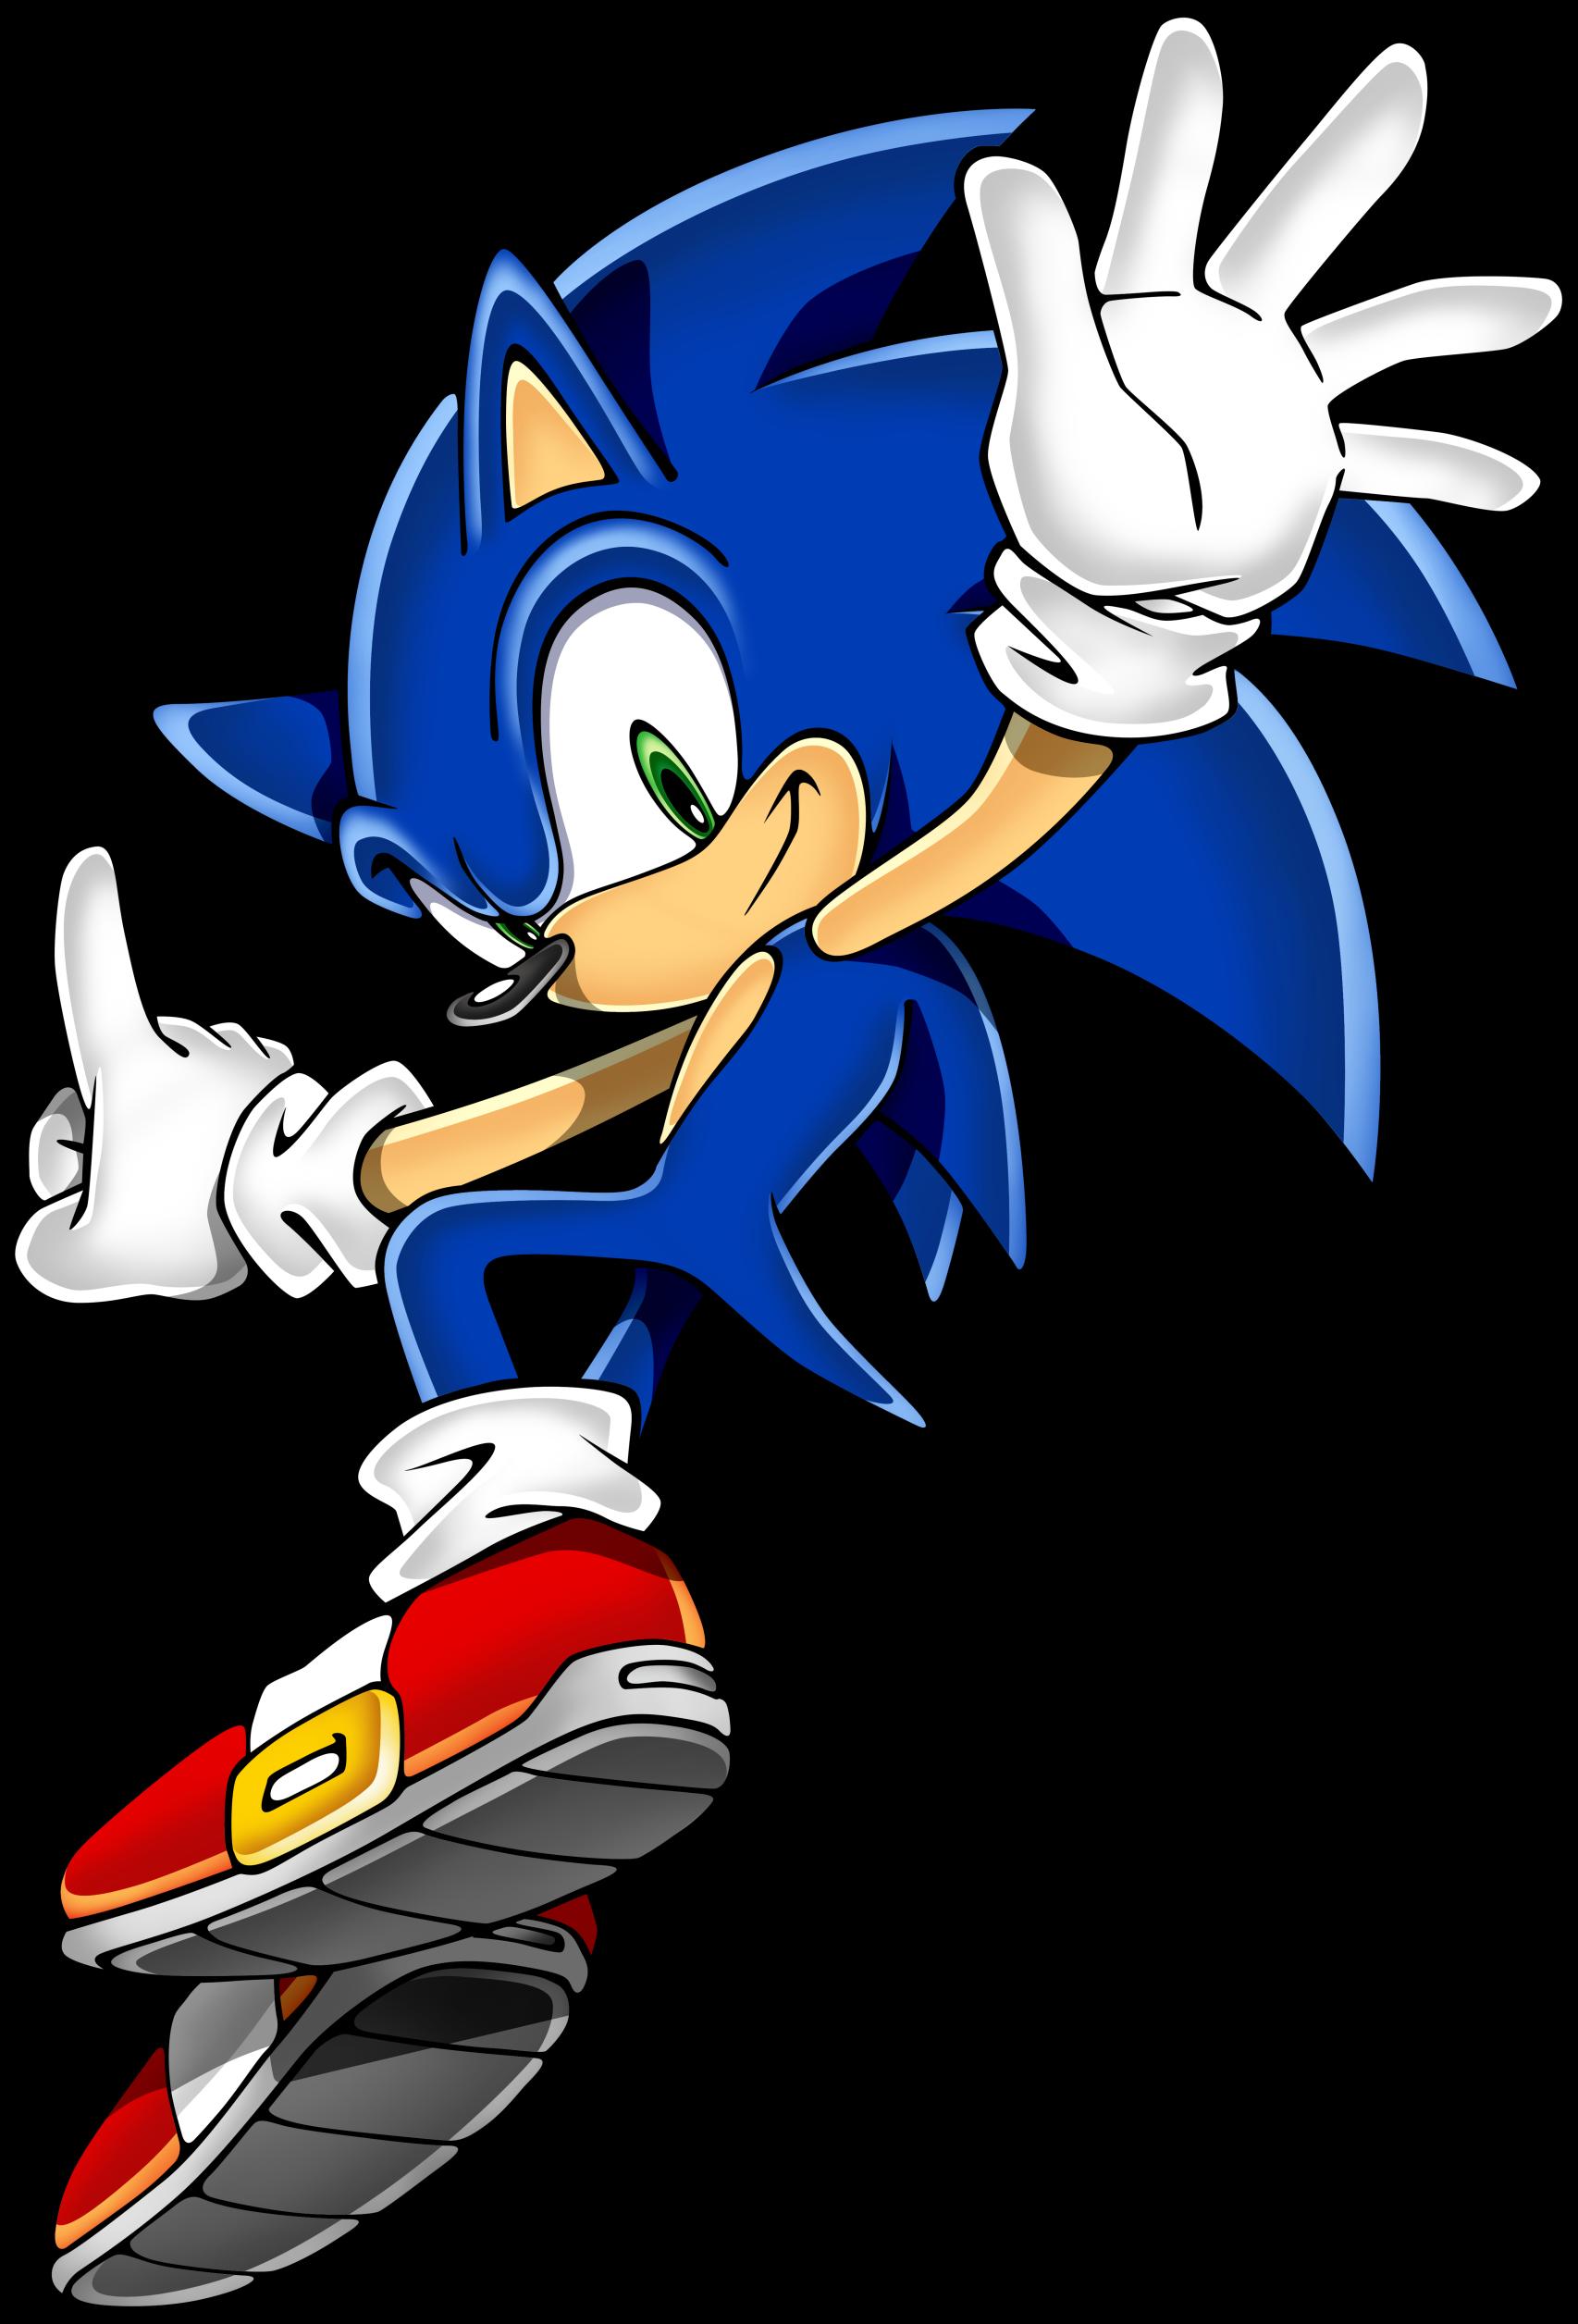 Sega Sonic the Hedgehog 25th Anniversary Art Book 1991 - 2016 hardback with DJ